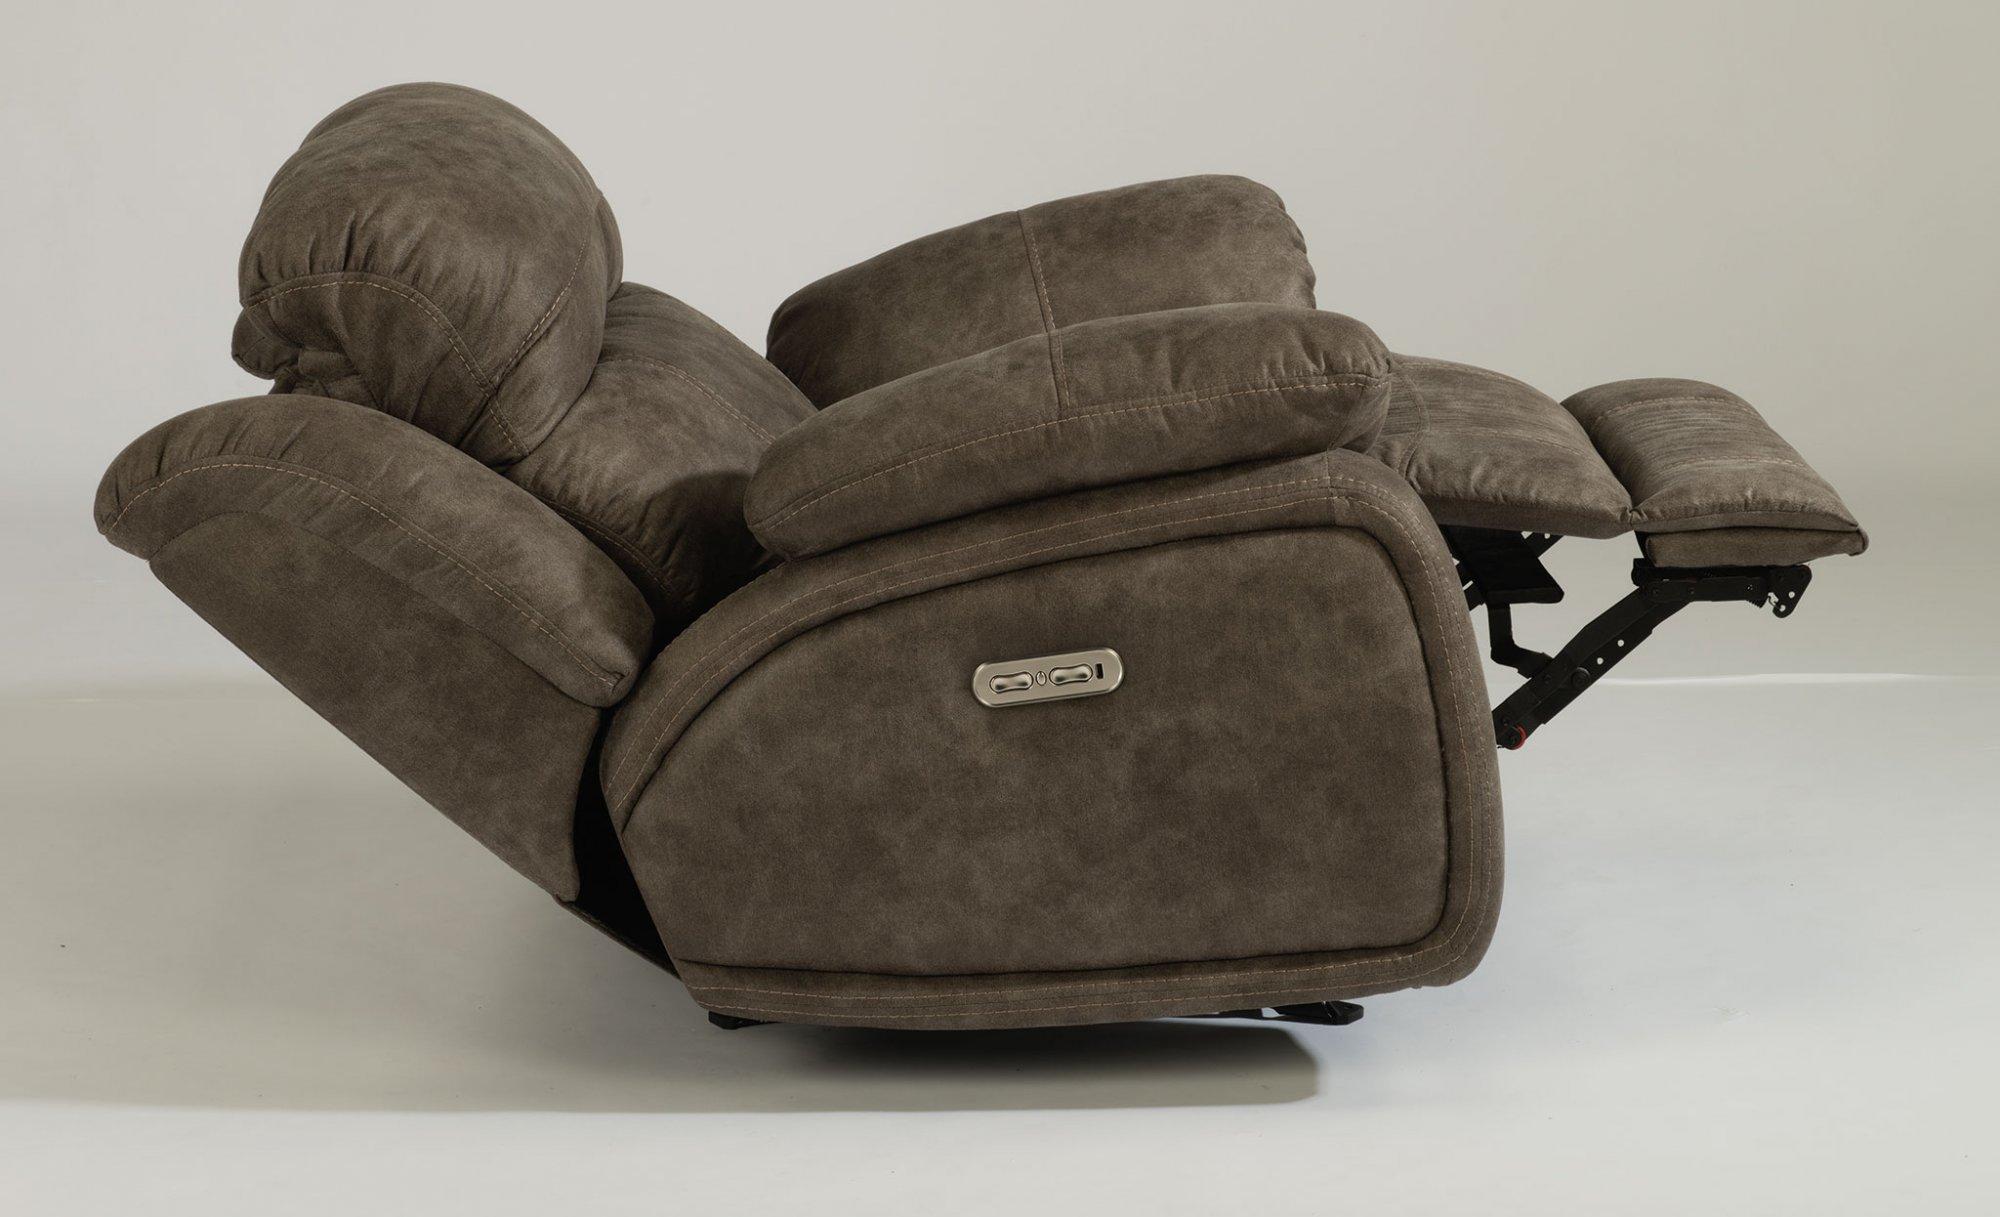 Astounding Flexsteel 1408 54Ph Como Fabric Power Gliding Recliner Pdpeps Interior Chair Design Pdpepsorg